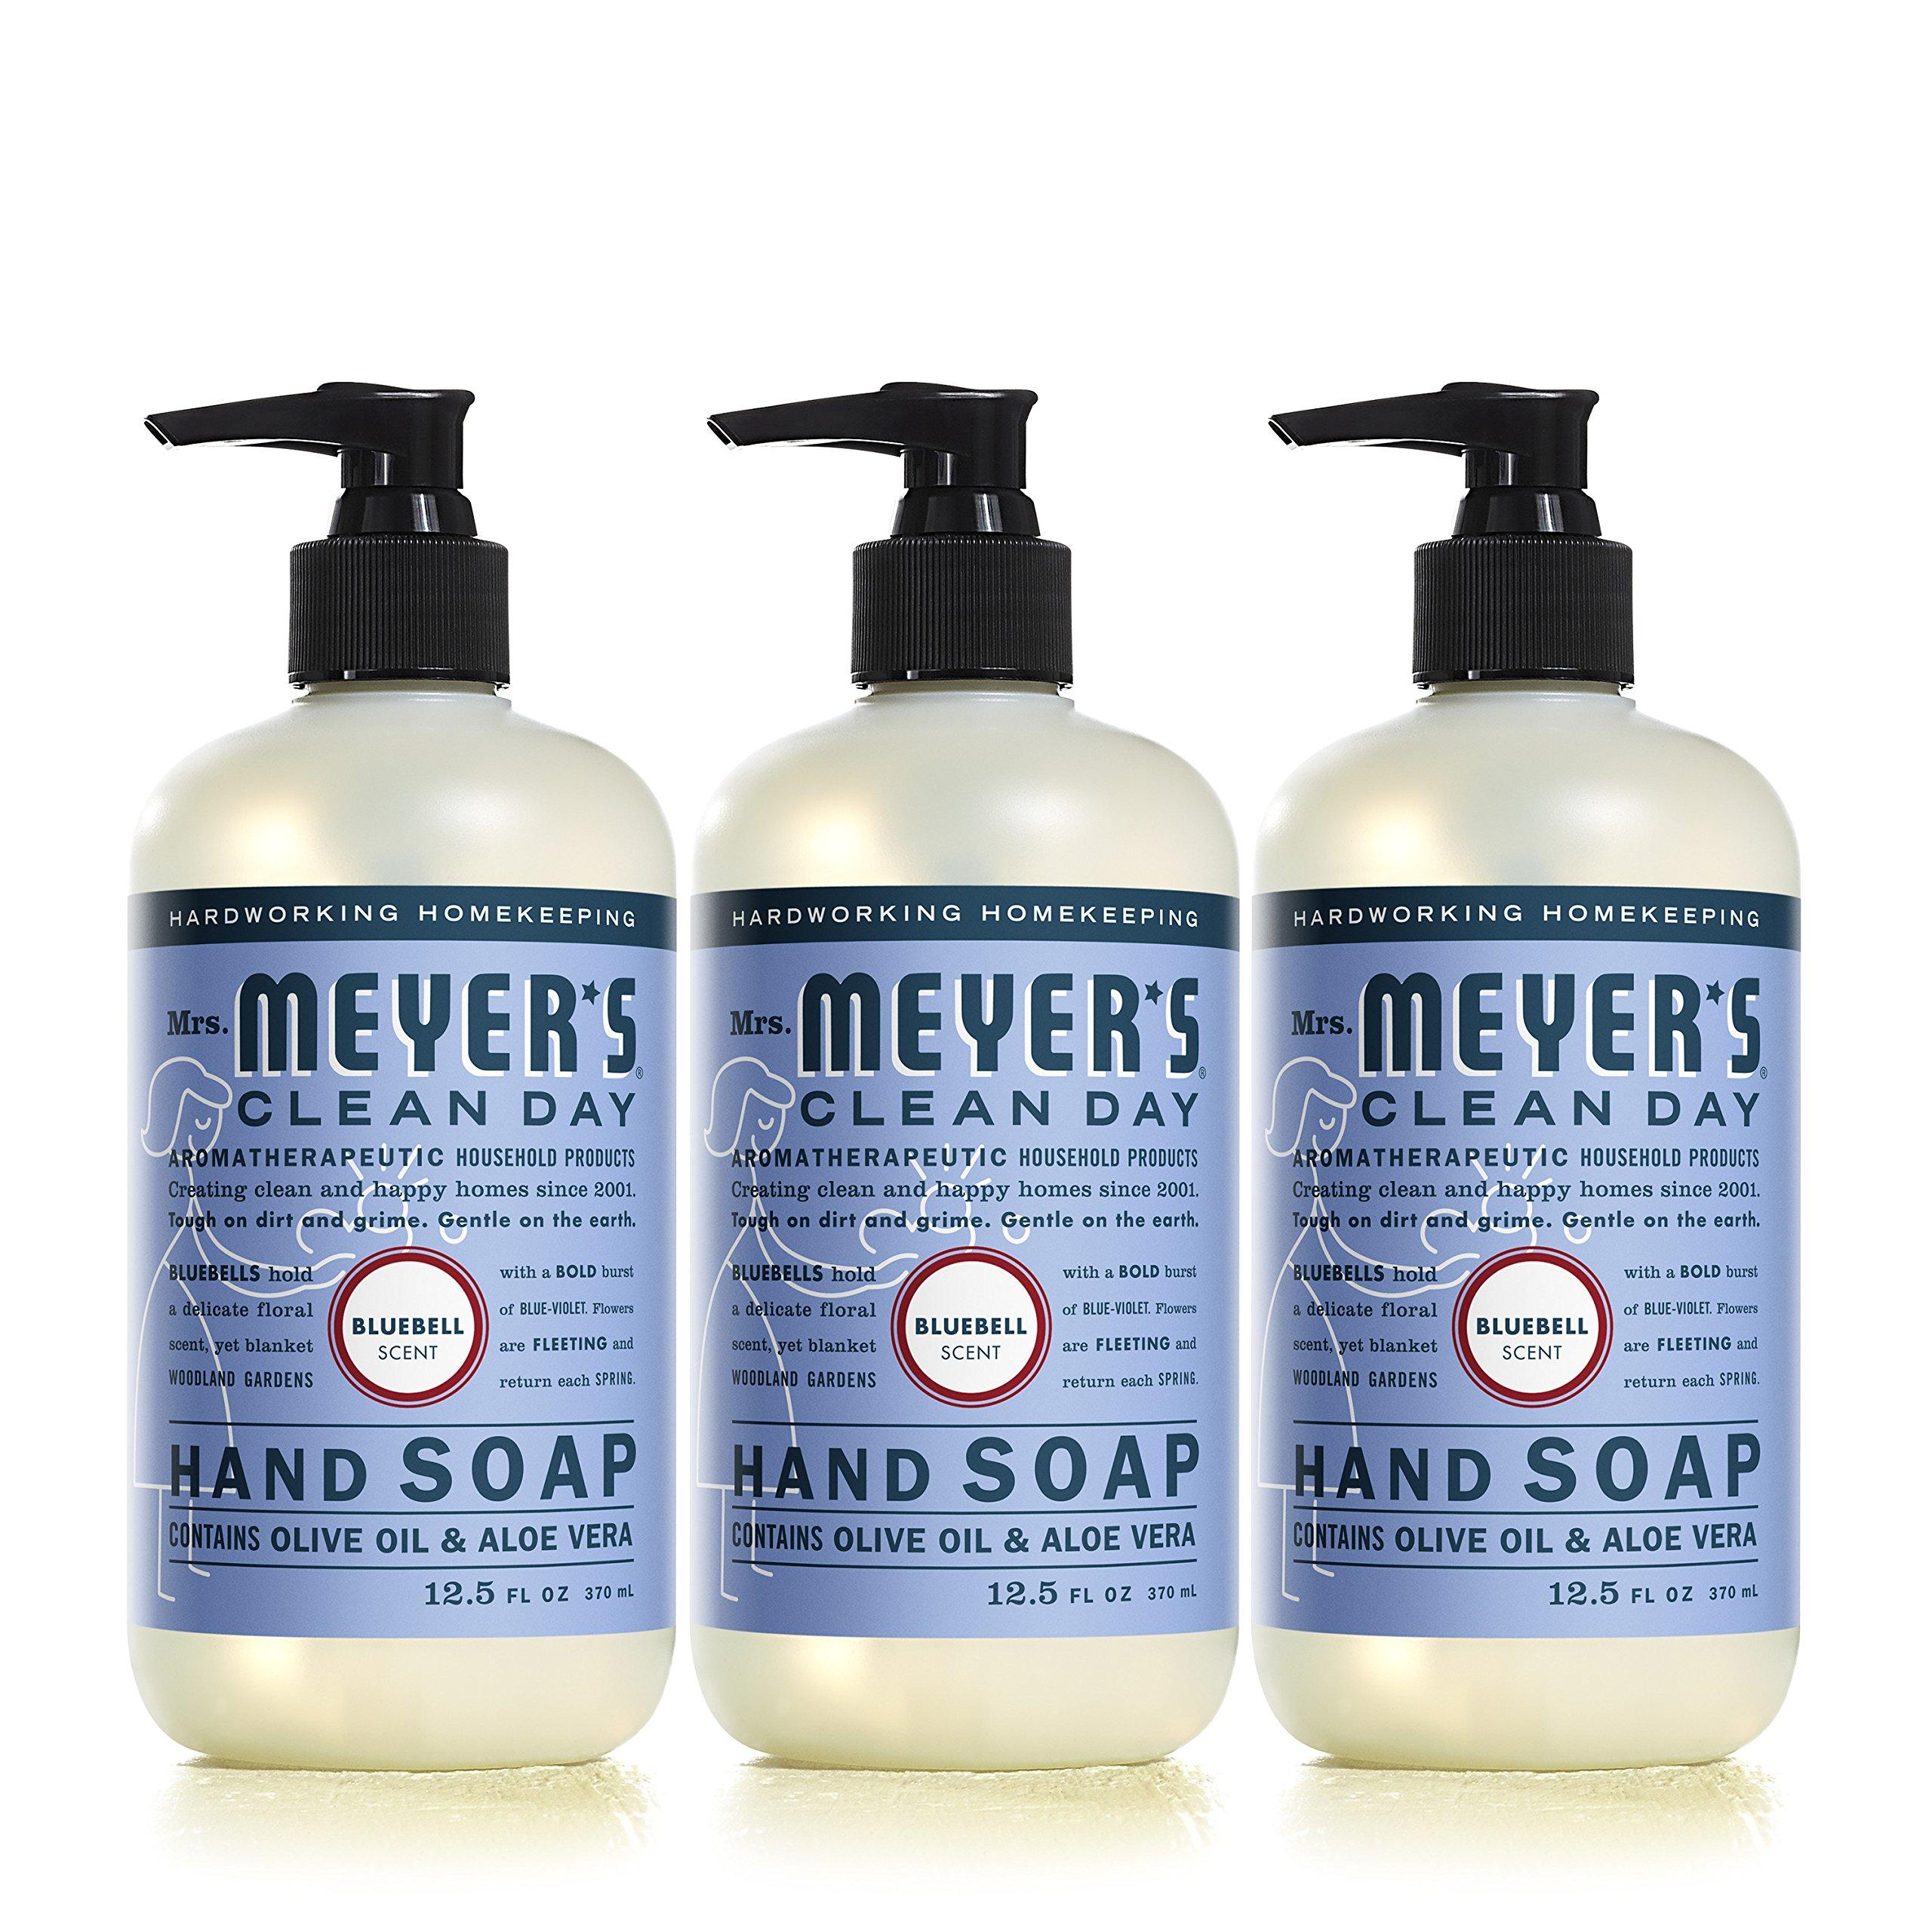 Mrs. Meyer´s Clean Day Hand Soap, Bluebell, 12.5 fl oz, 3 ct by Mrs. Meyer's Clean Day